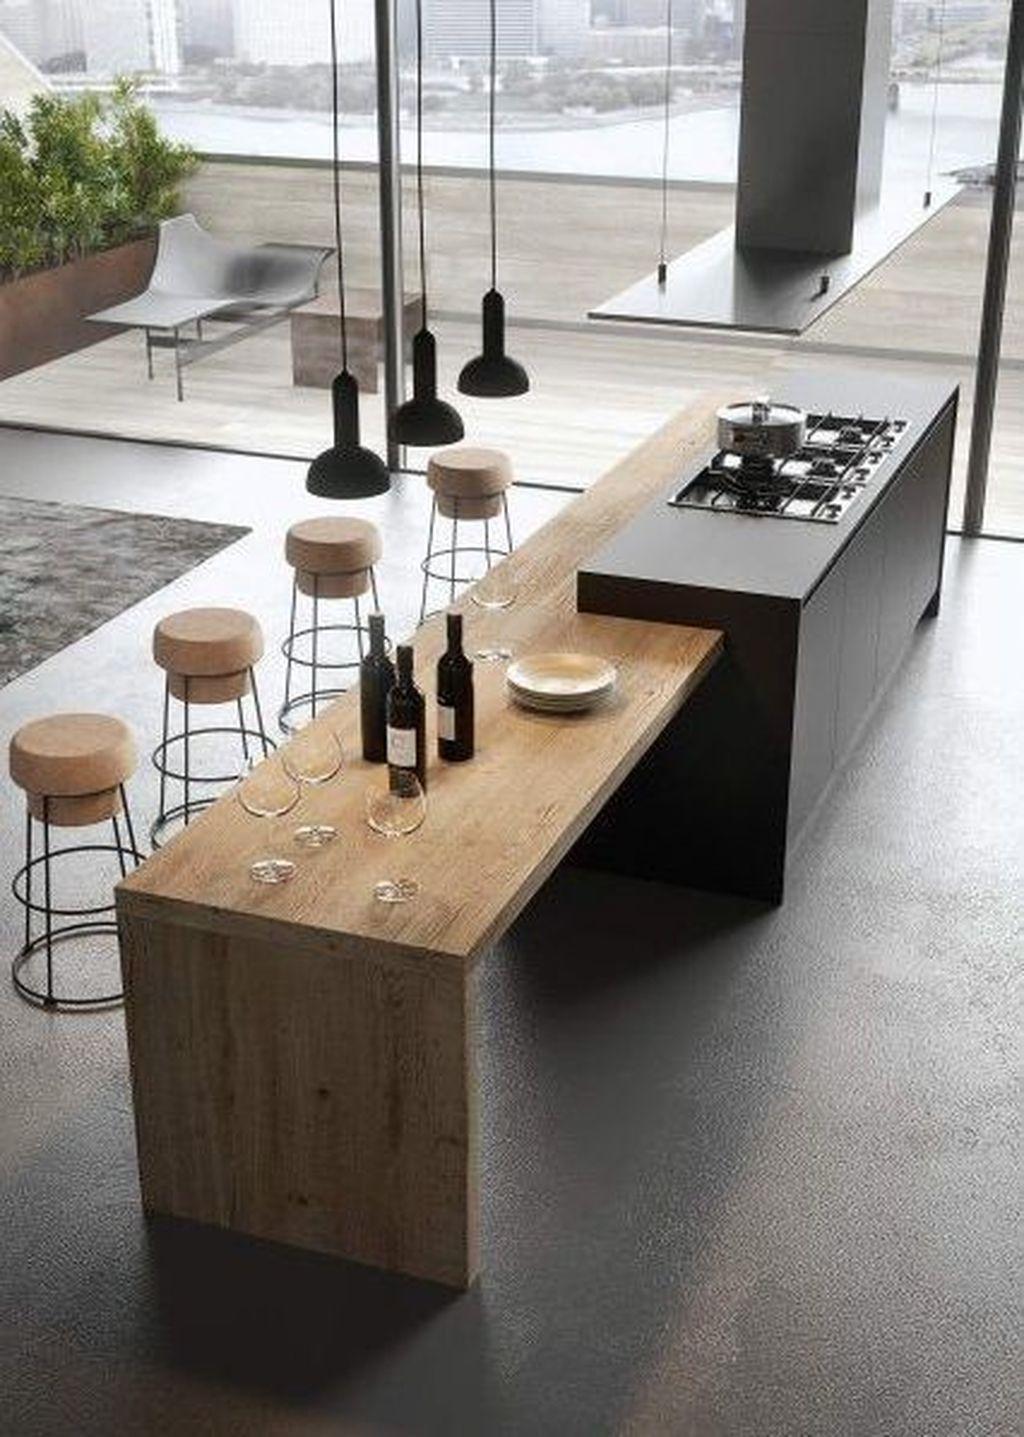 7 Best Kitchen Lighting Ideas Modern Light Fixtures For Home Dapur Modern Desain Interior Dan Dapur Kecil